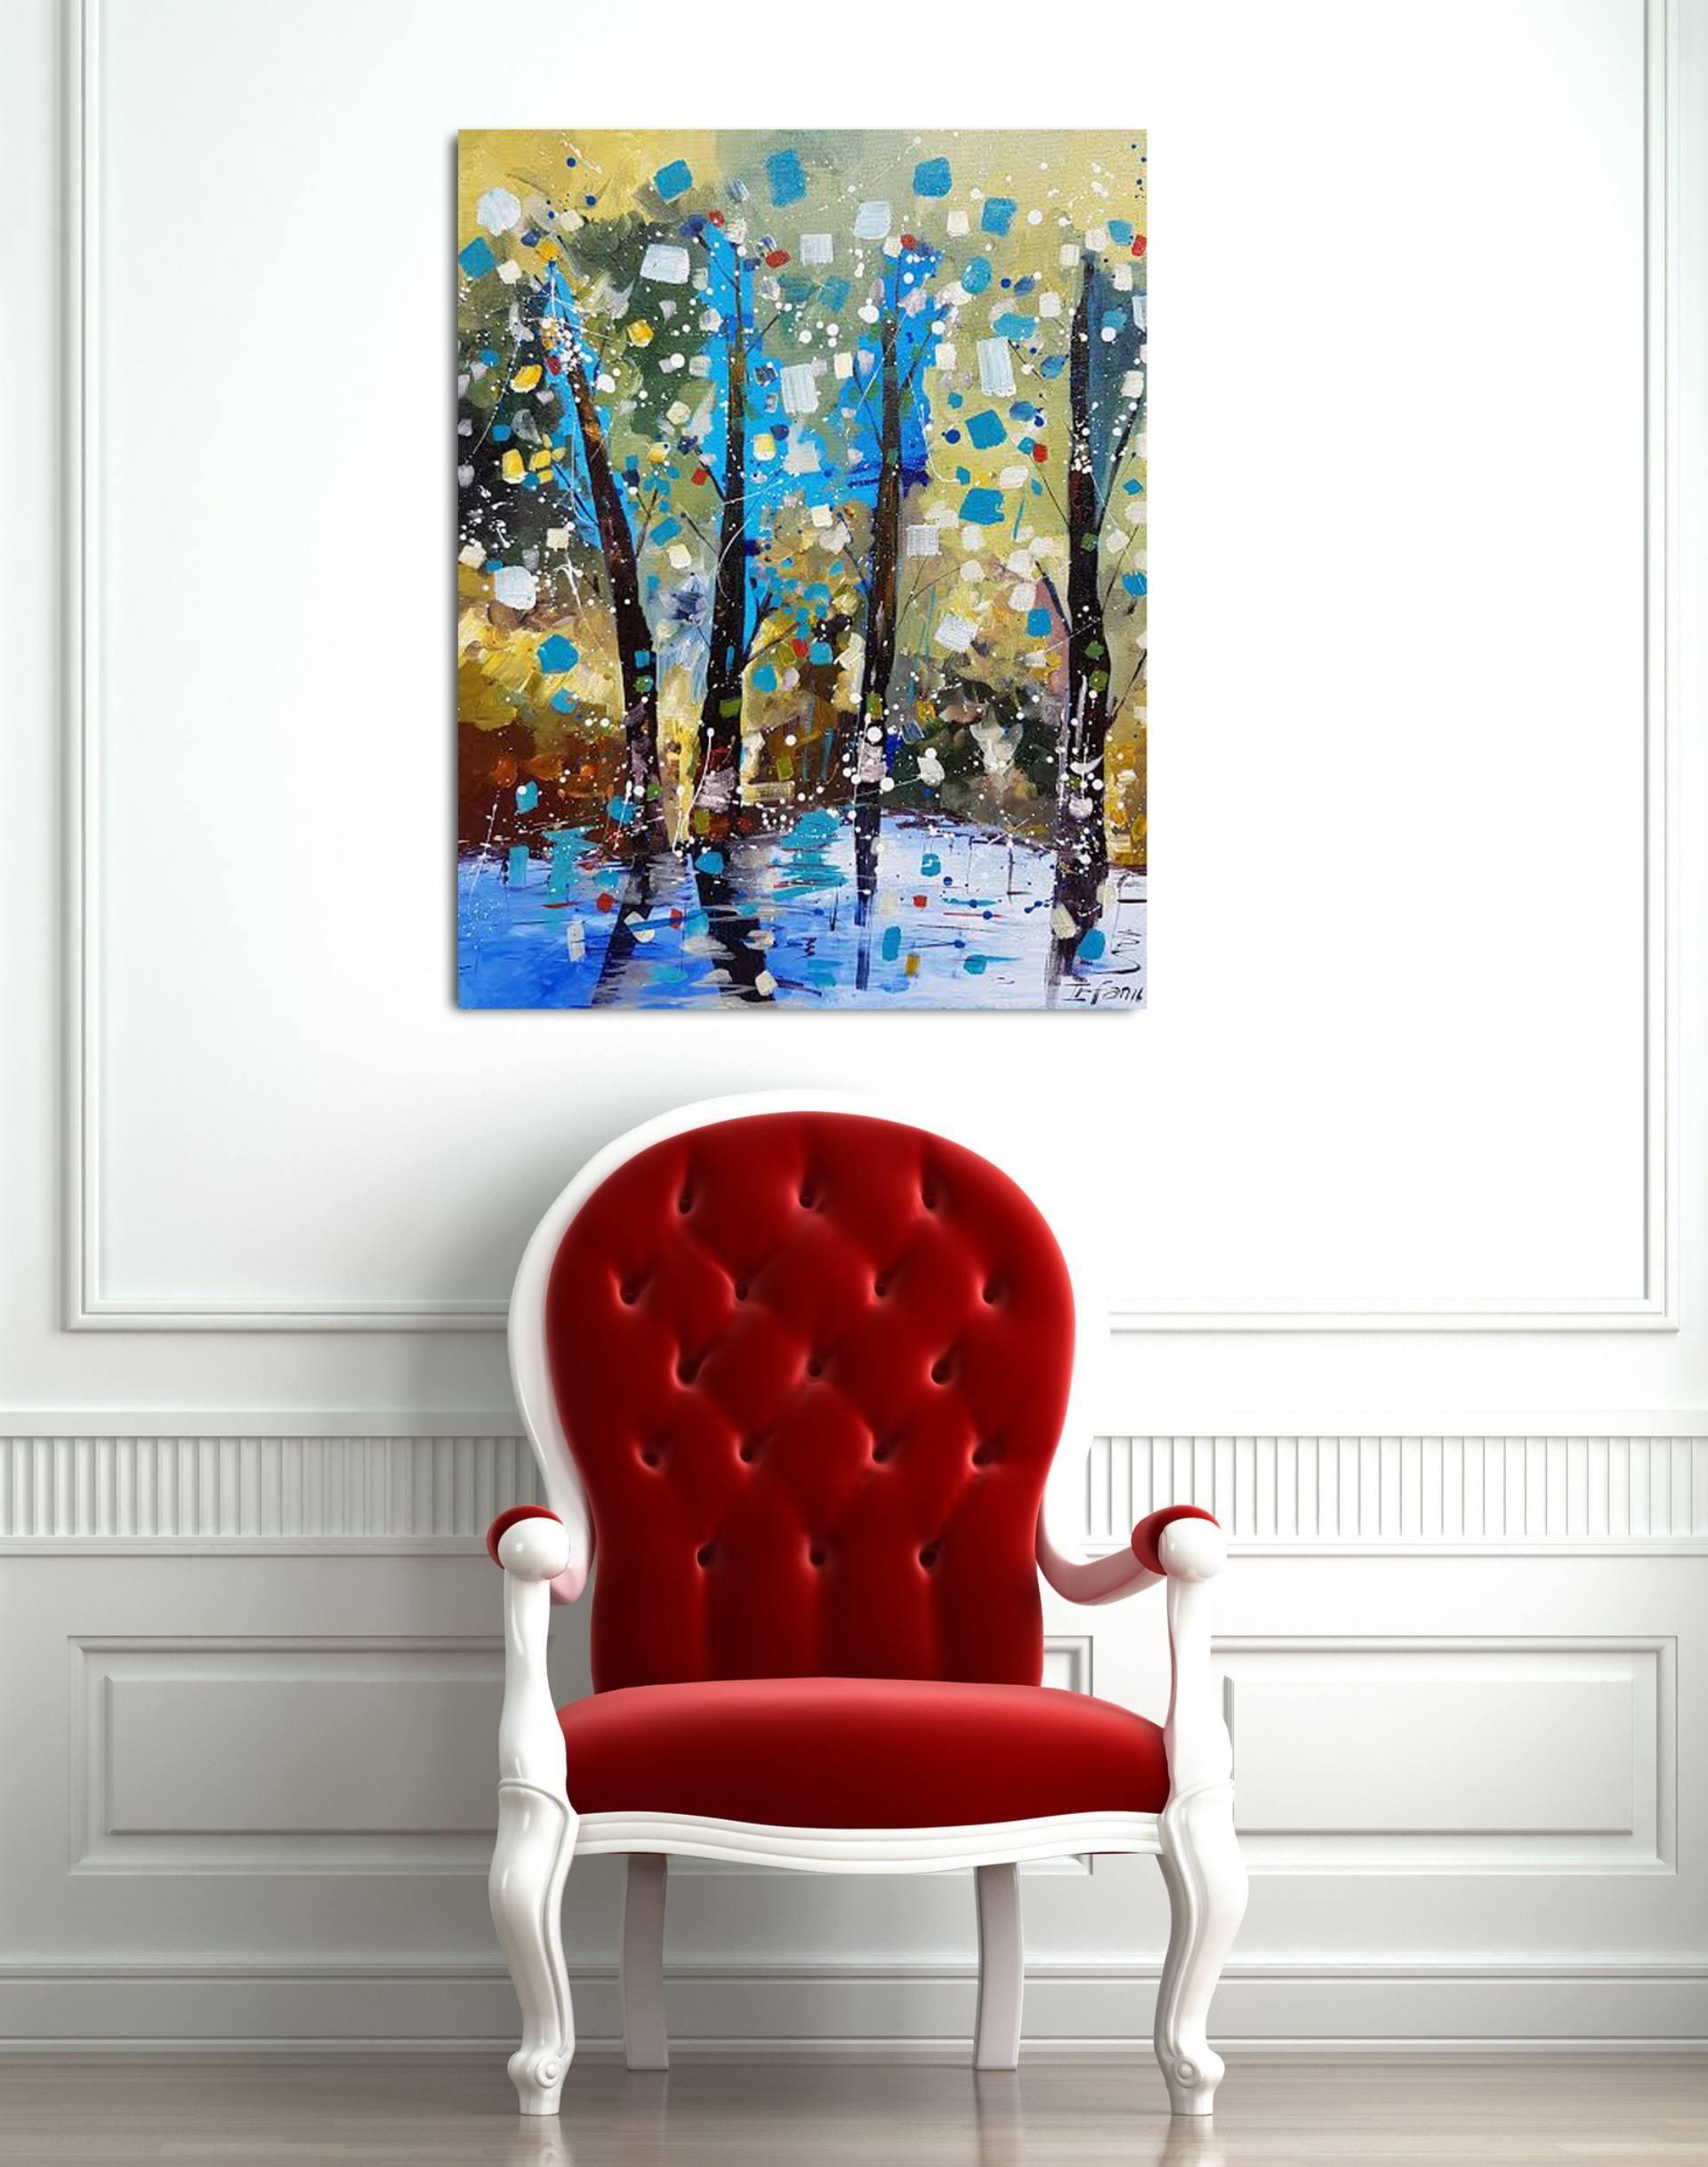 Saatchi Art: Colors Of Autumn/ Spring Impression Landscape Regarding Autumn  Inspired Wall Art (Image 17 of 20)